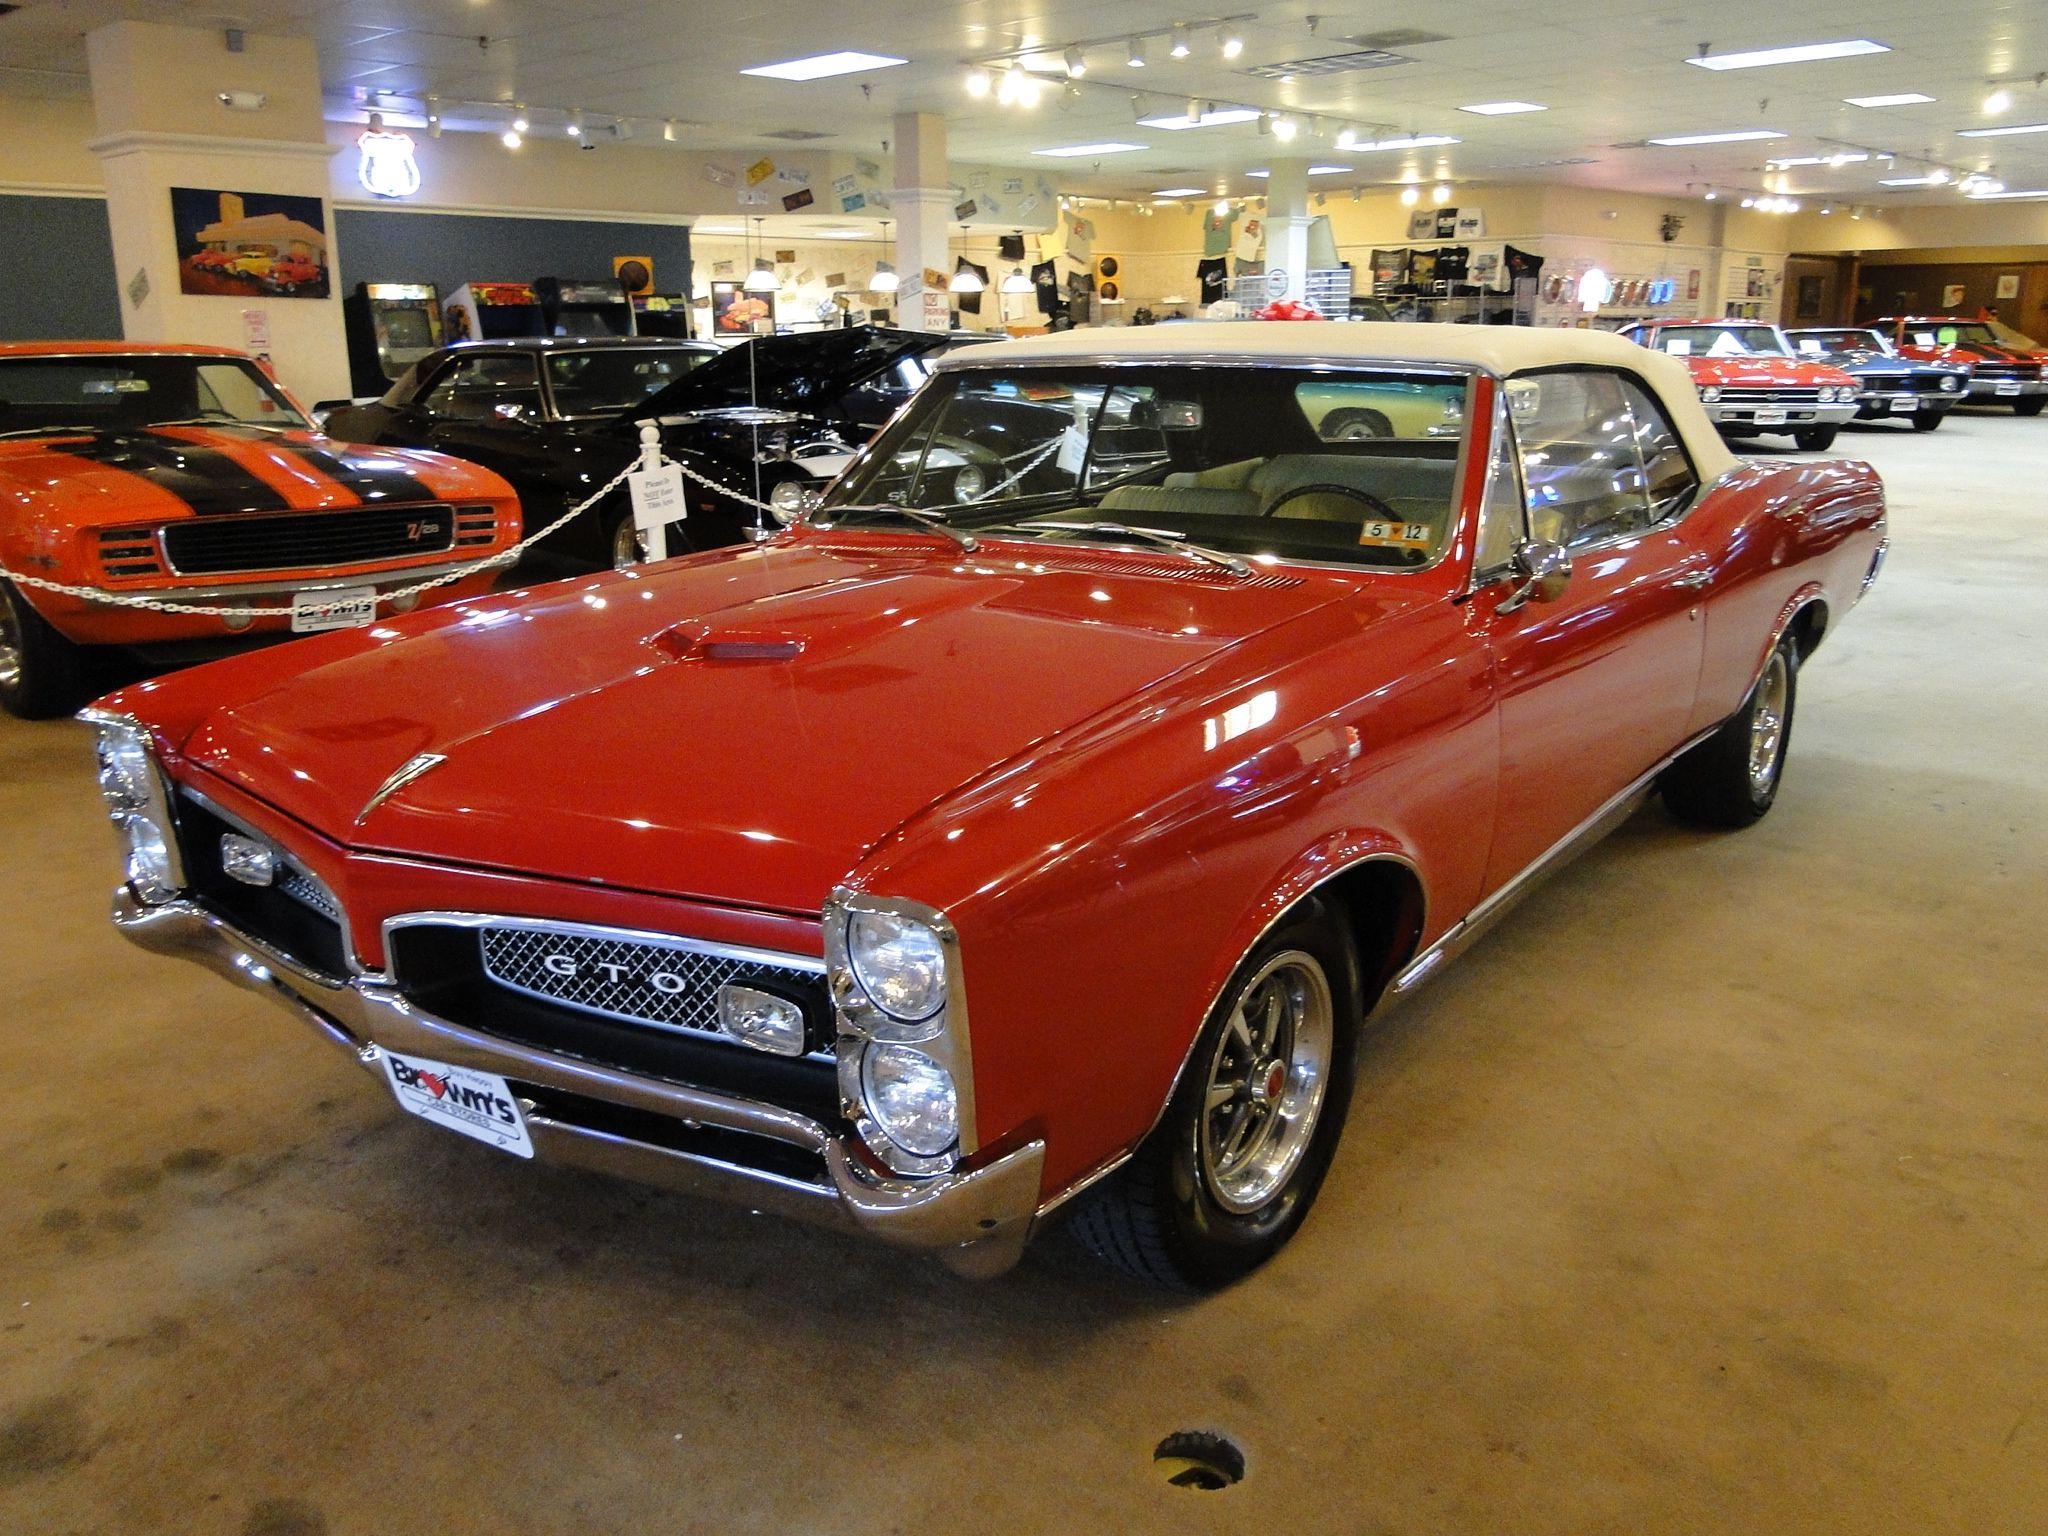 1967 Pontiac GTO CONVERTIBLE Convertible Glen Burnie MD | Hot Cars ...